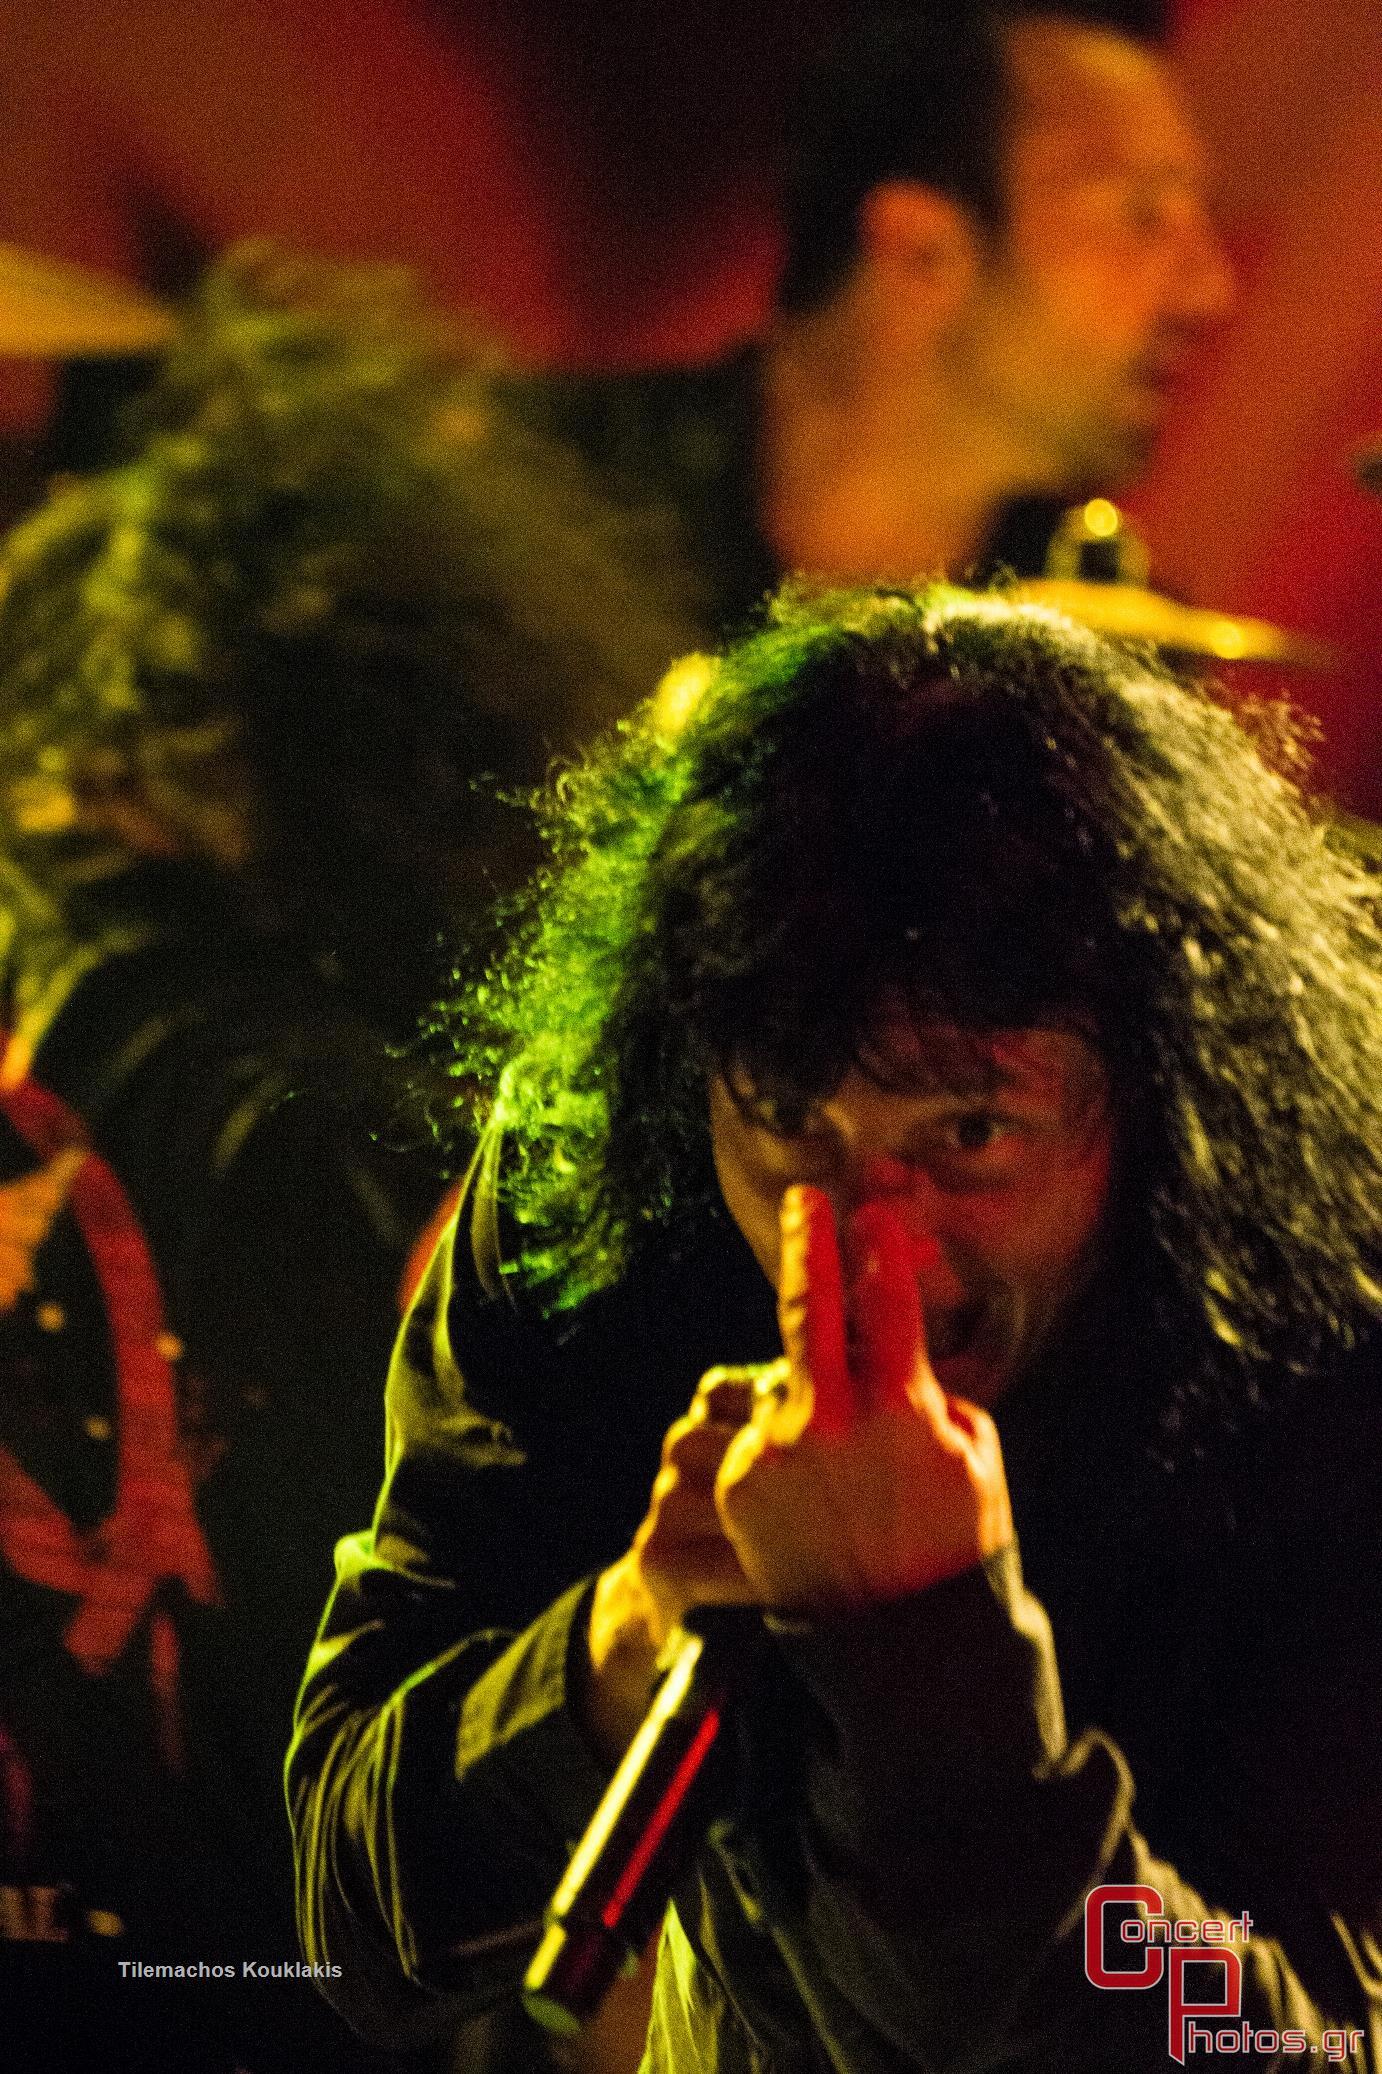 Anthrax-Anthrax photographer: Tilemachos Kouklakis - IMG_2250